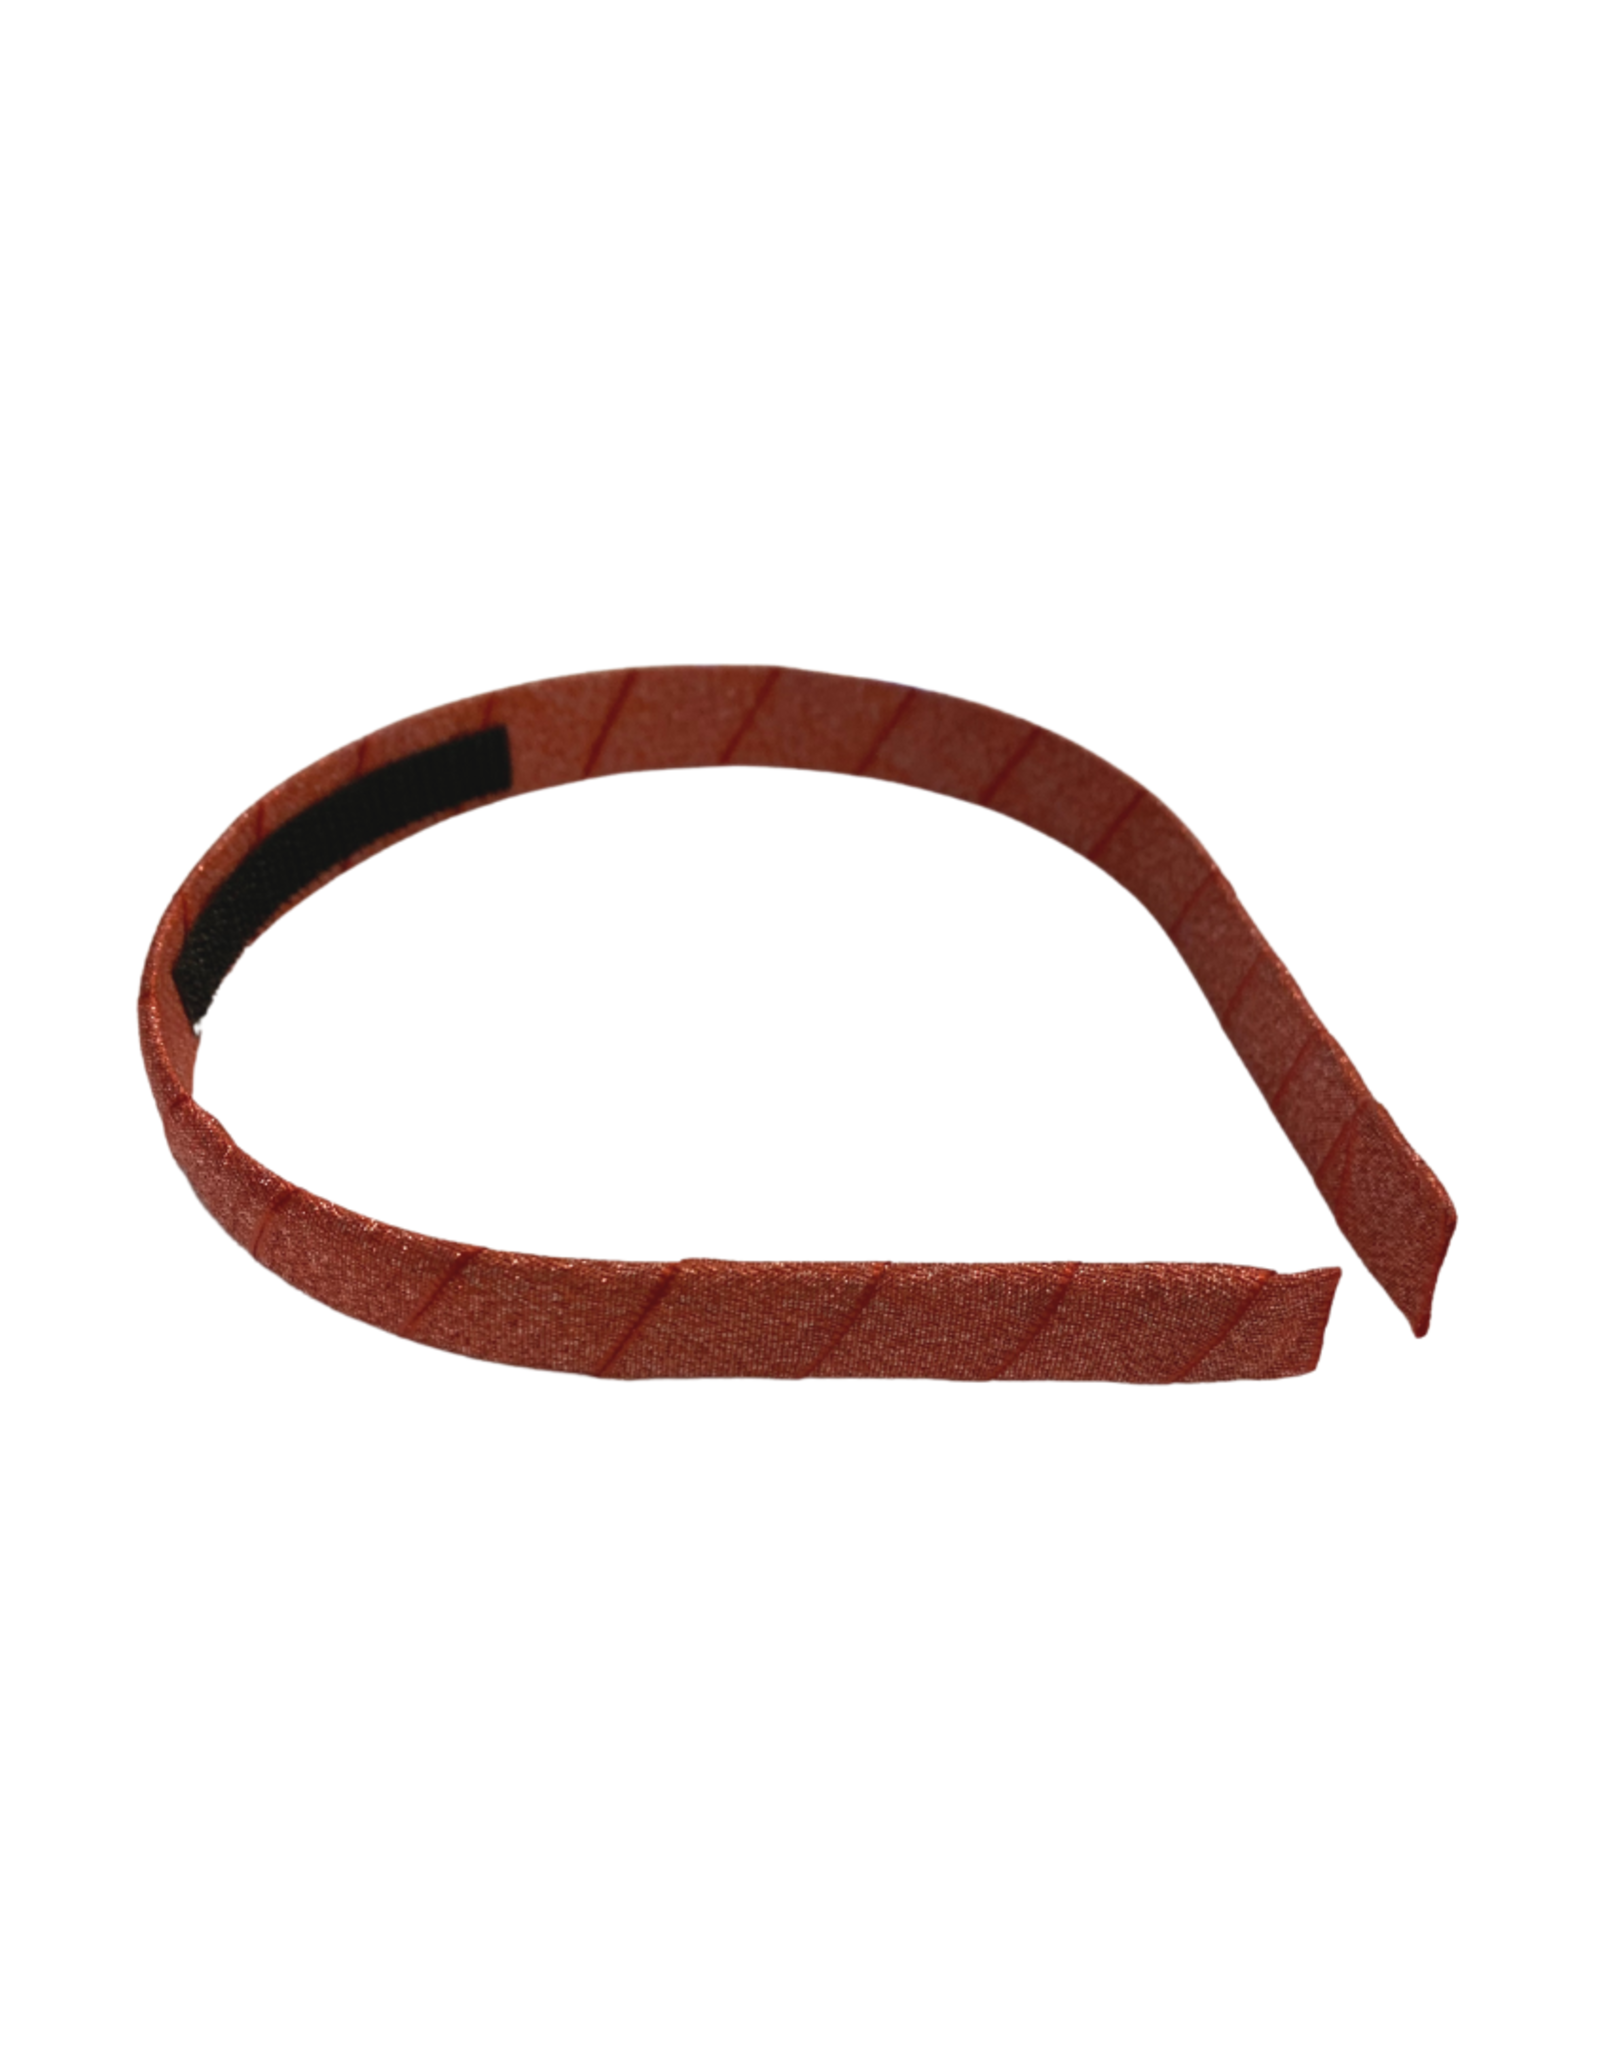 Bows Arts Diamond Dust Satin Headband - Red